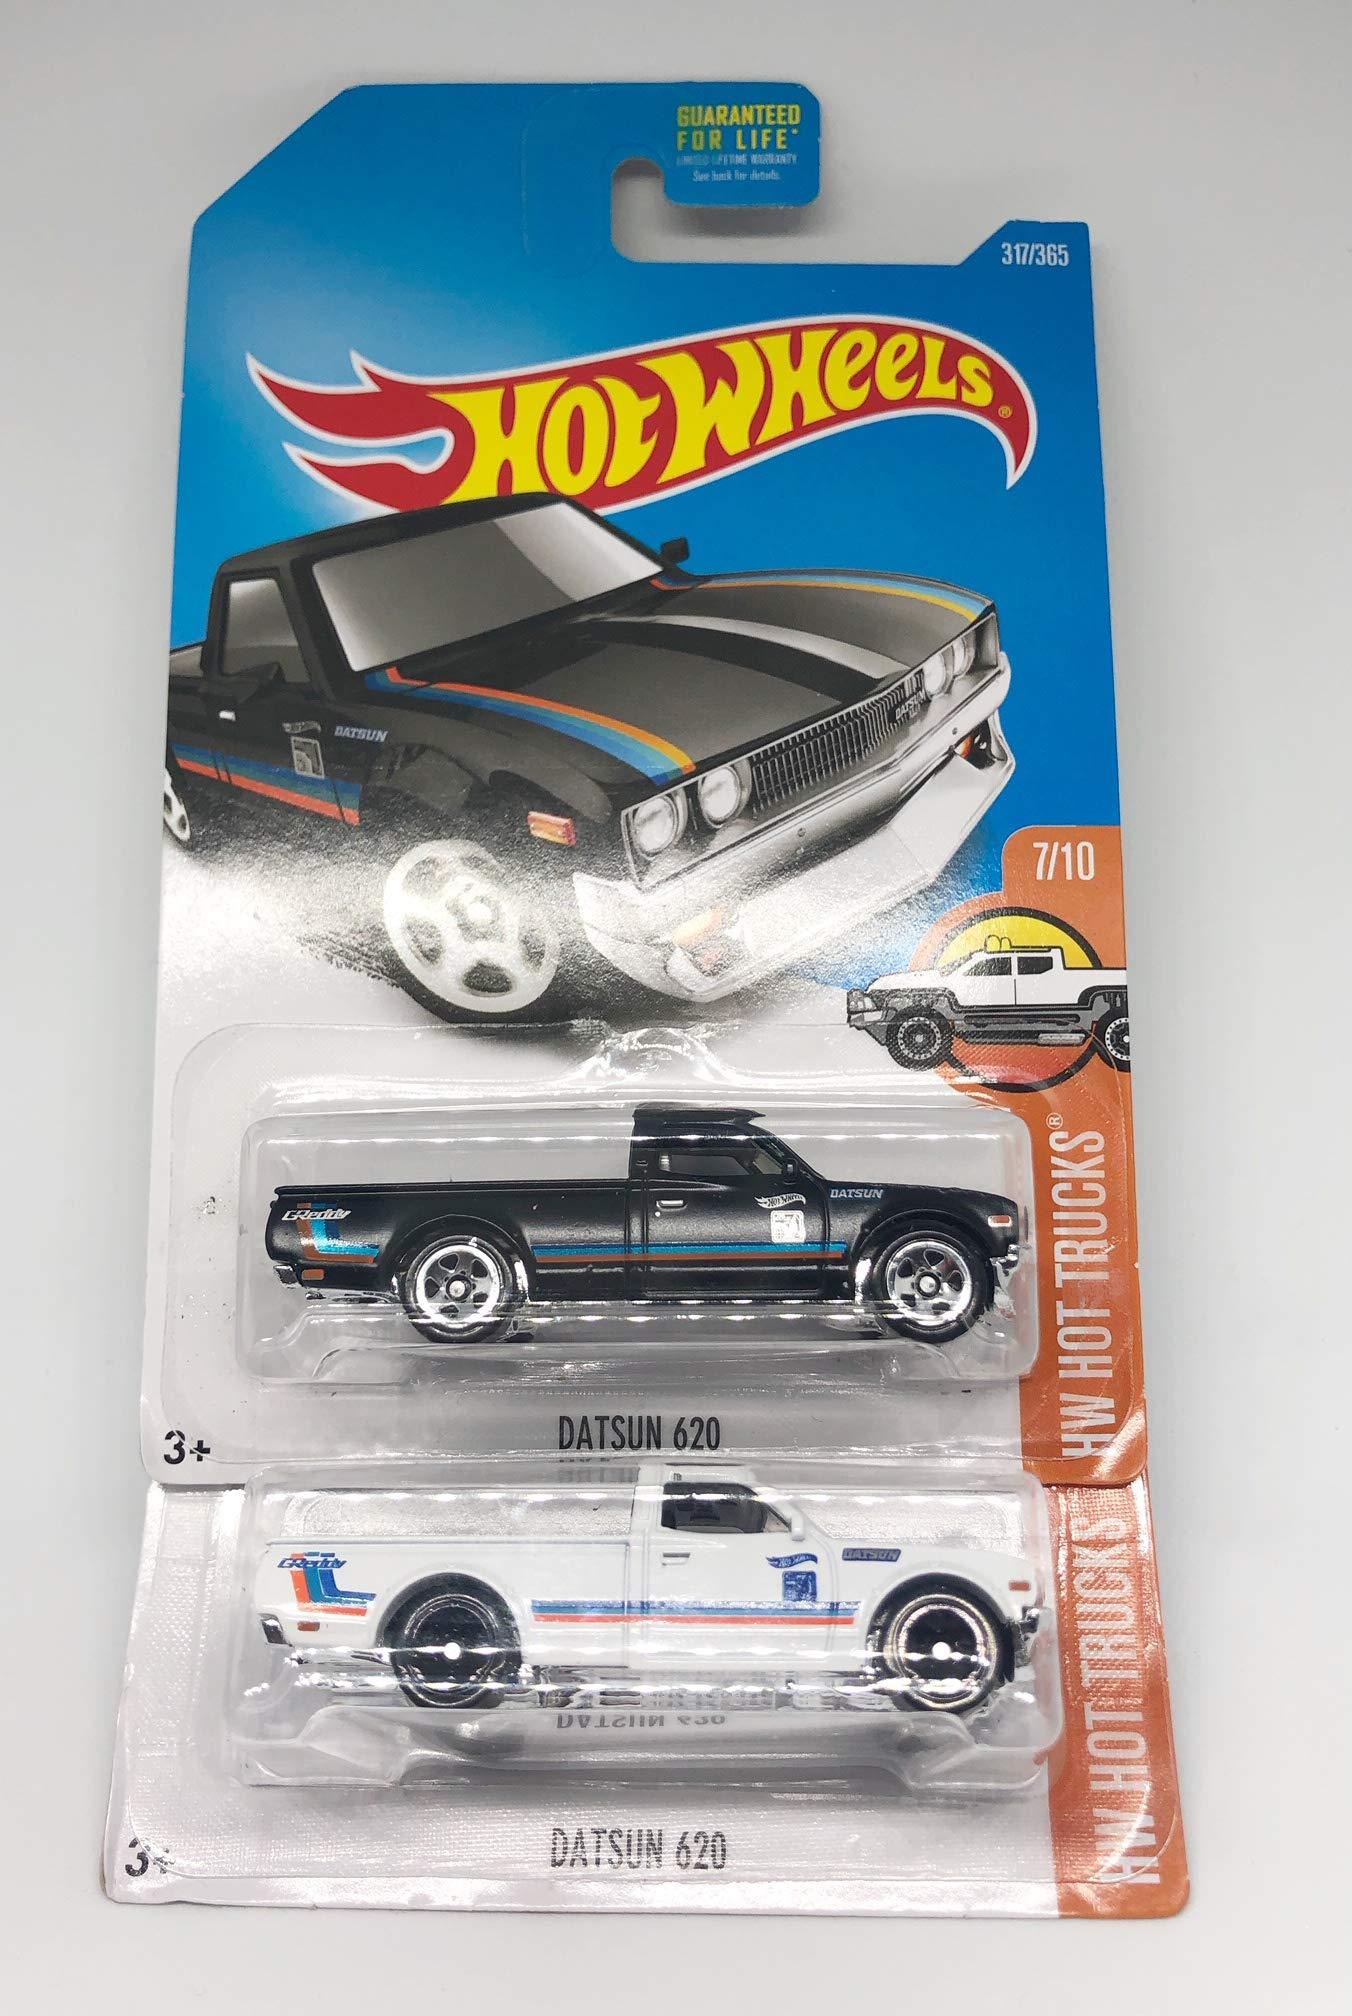 Hot Wheels Datsun 620 Black Top Deals Lowest Price Superofferscom